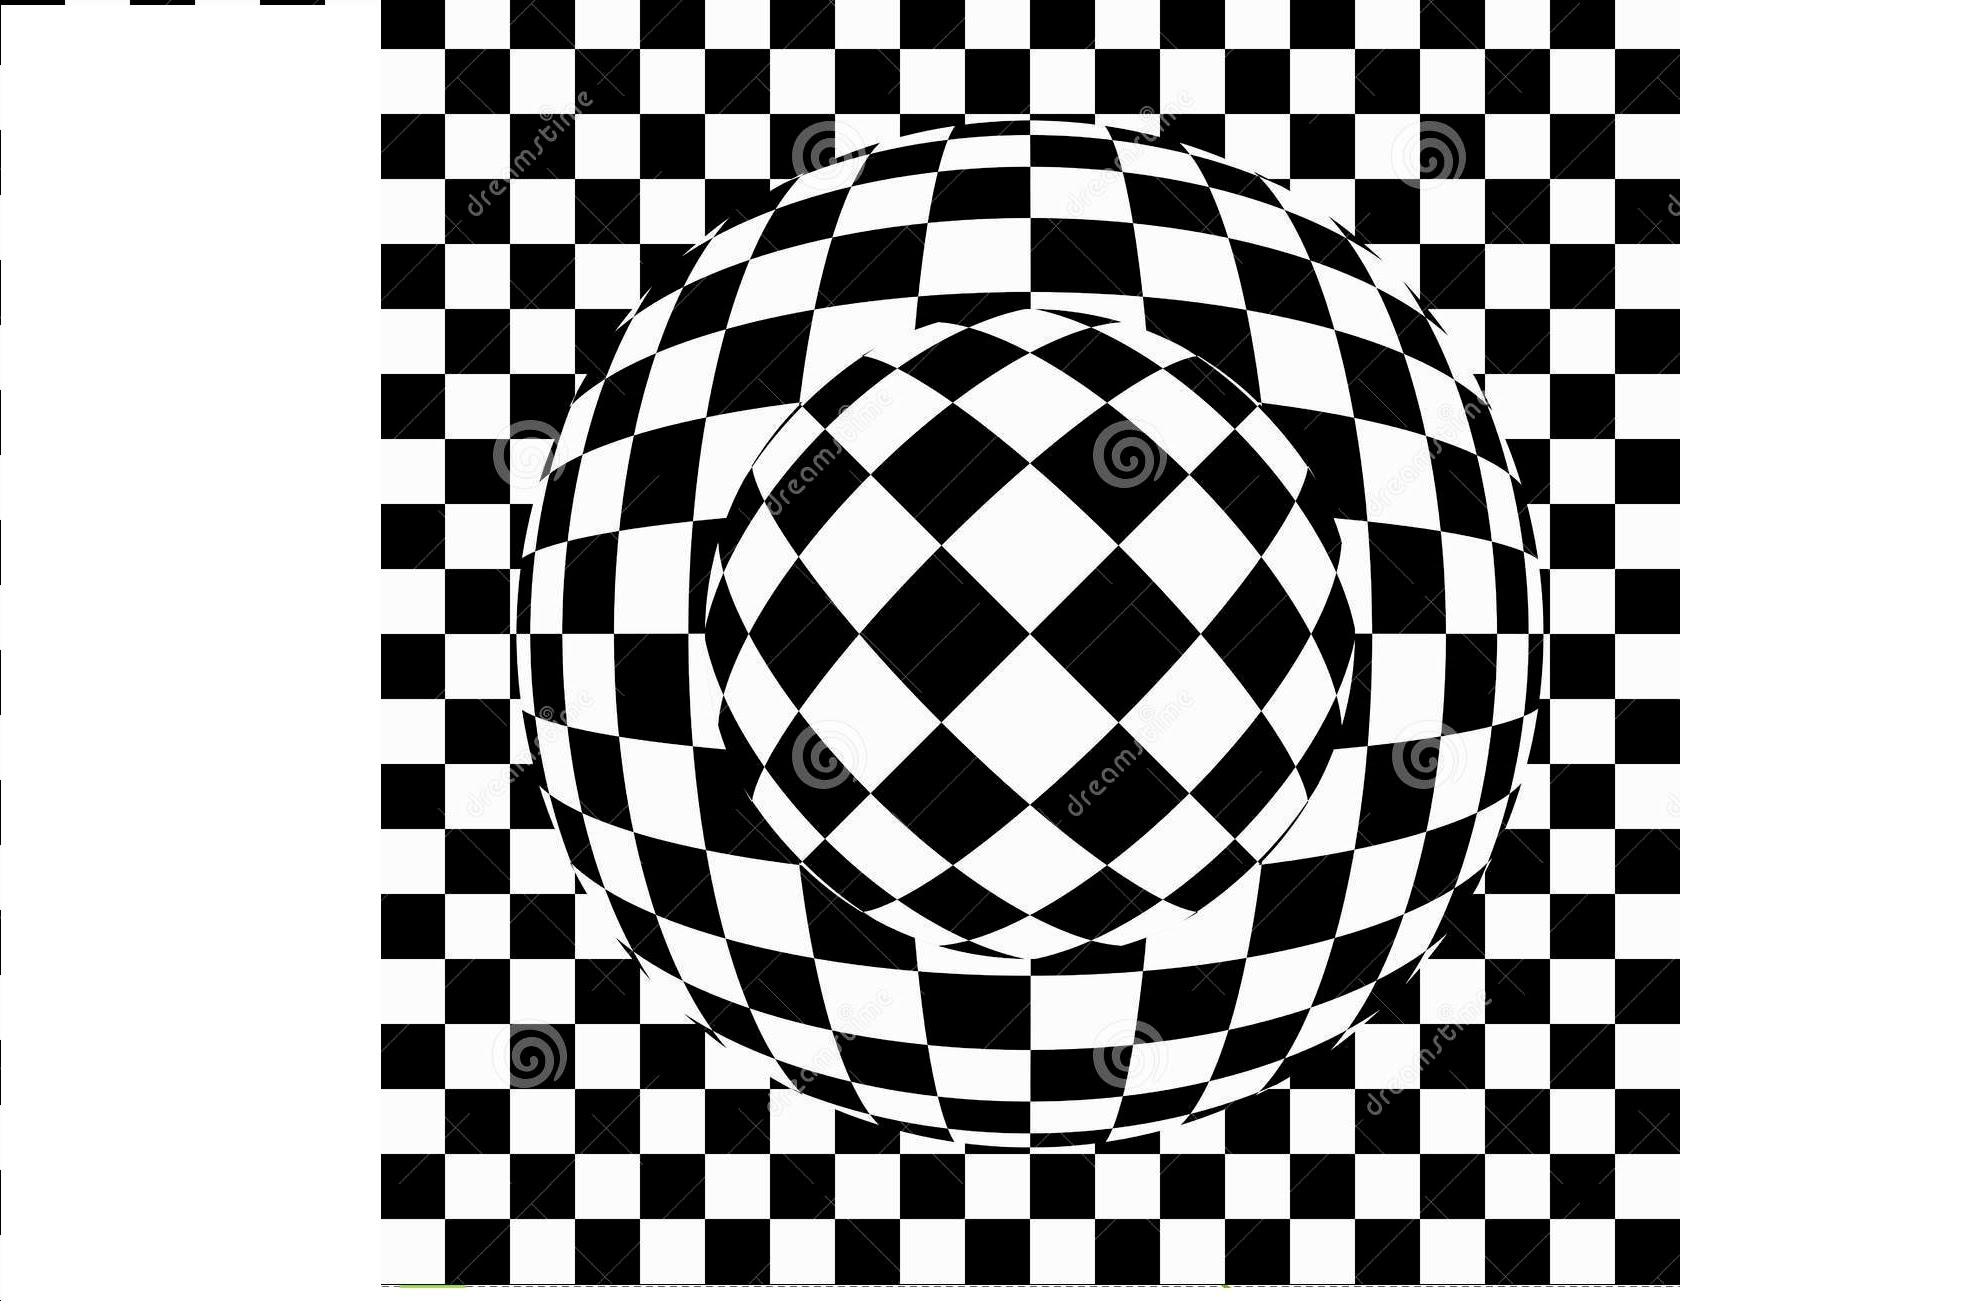 Drawn optical illusion black and white Double optical optical illusion eye